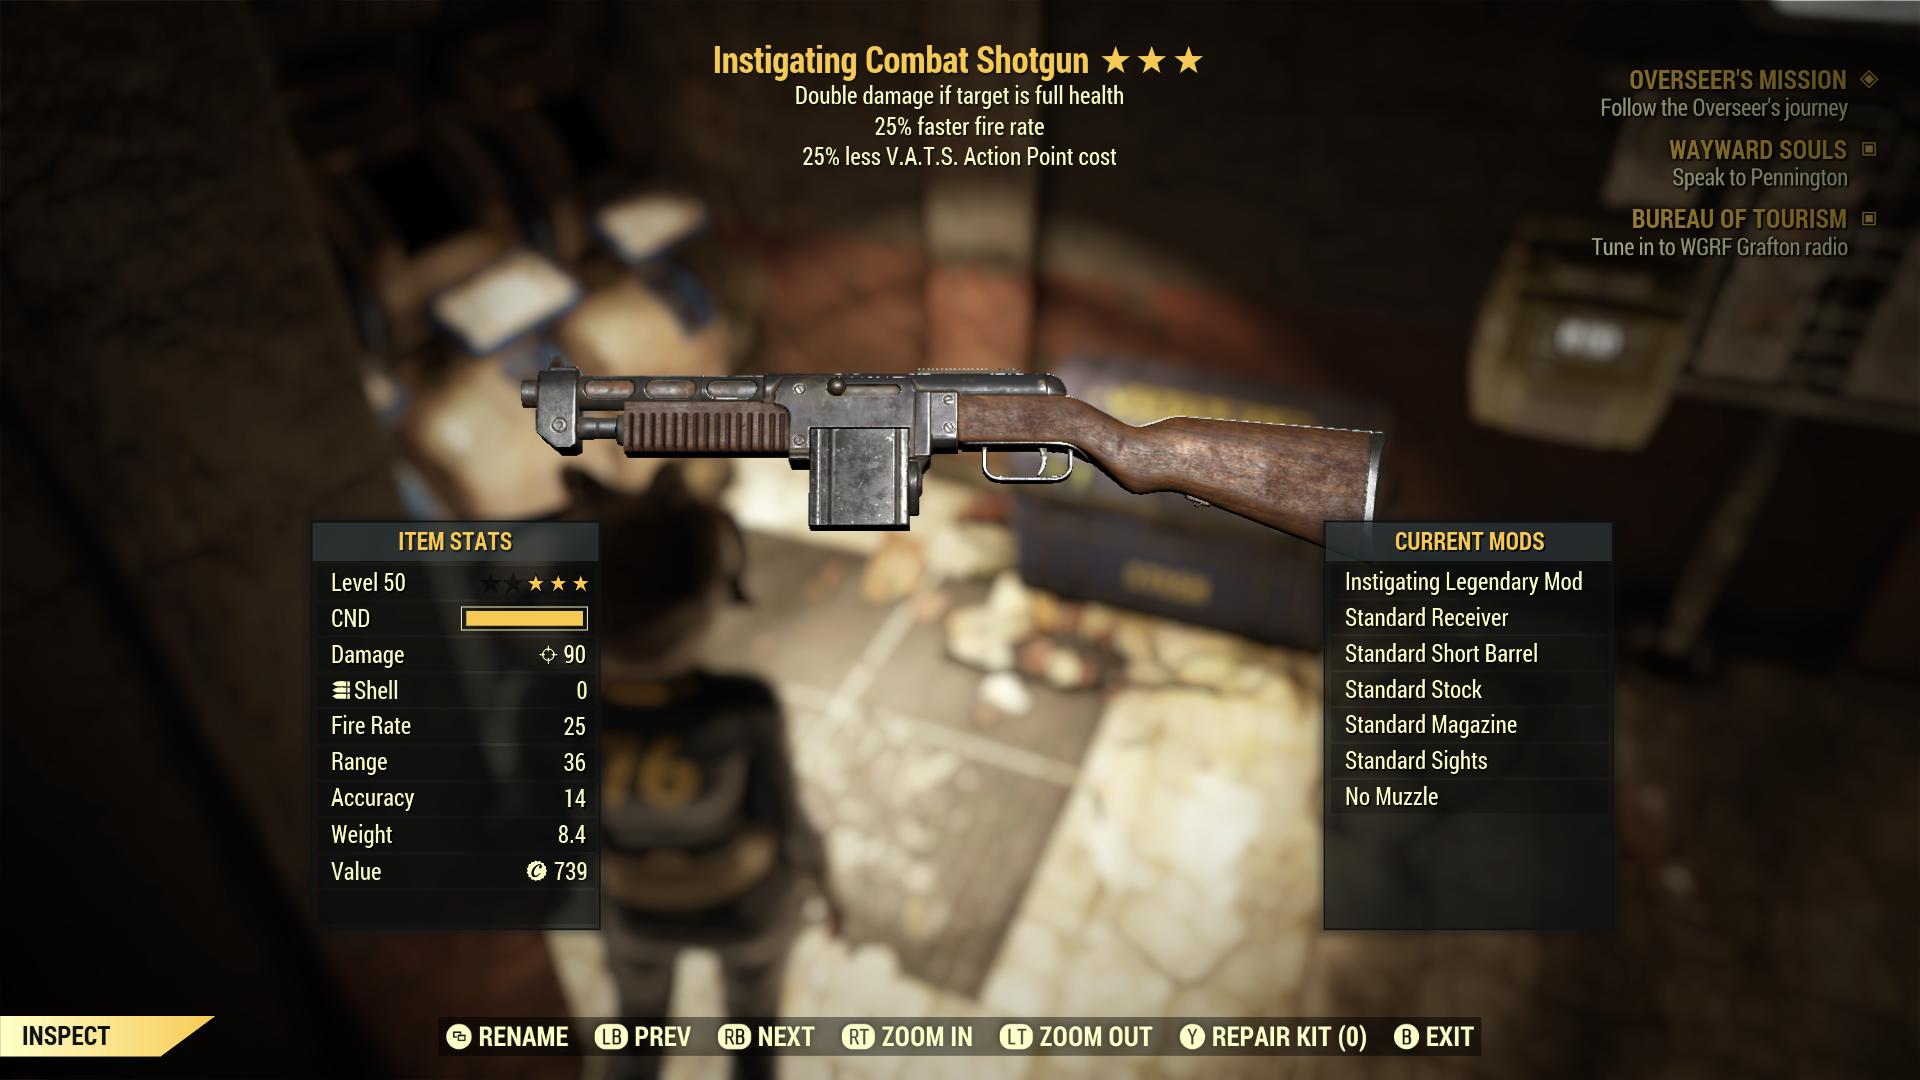 (New86)Instigating Combat Shotgun - Level 50